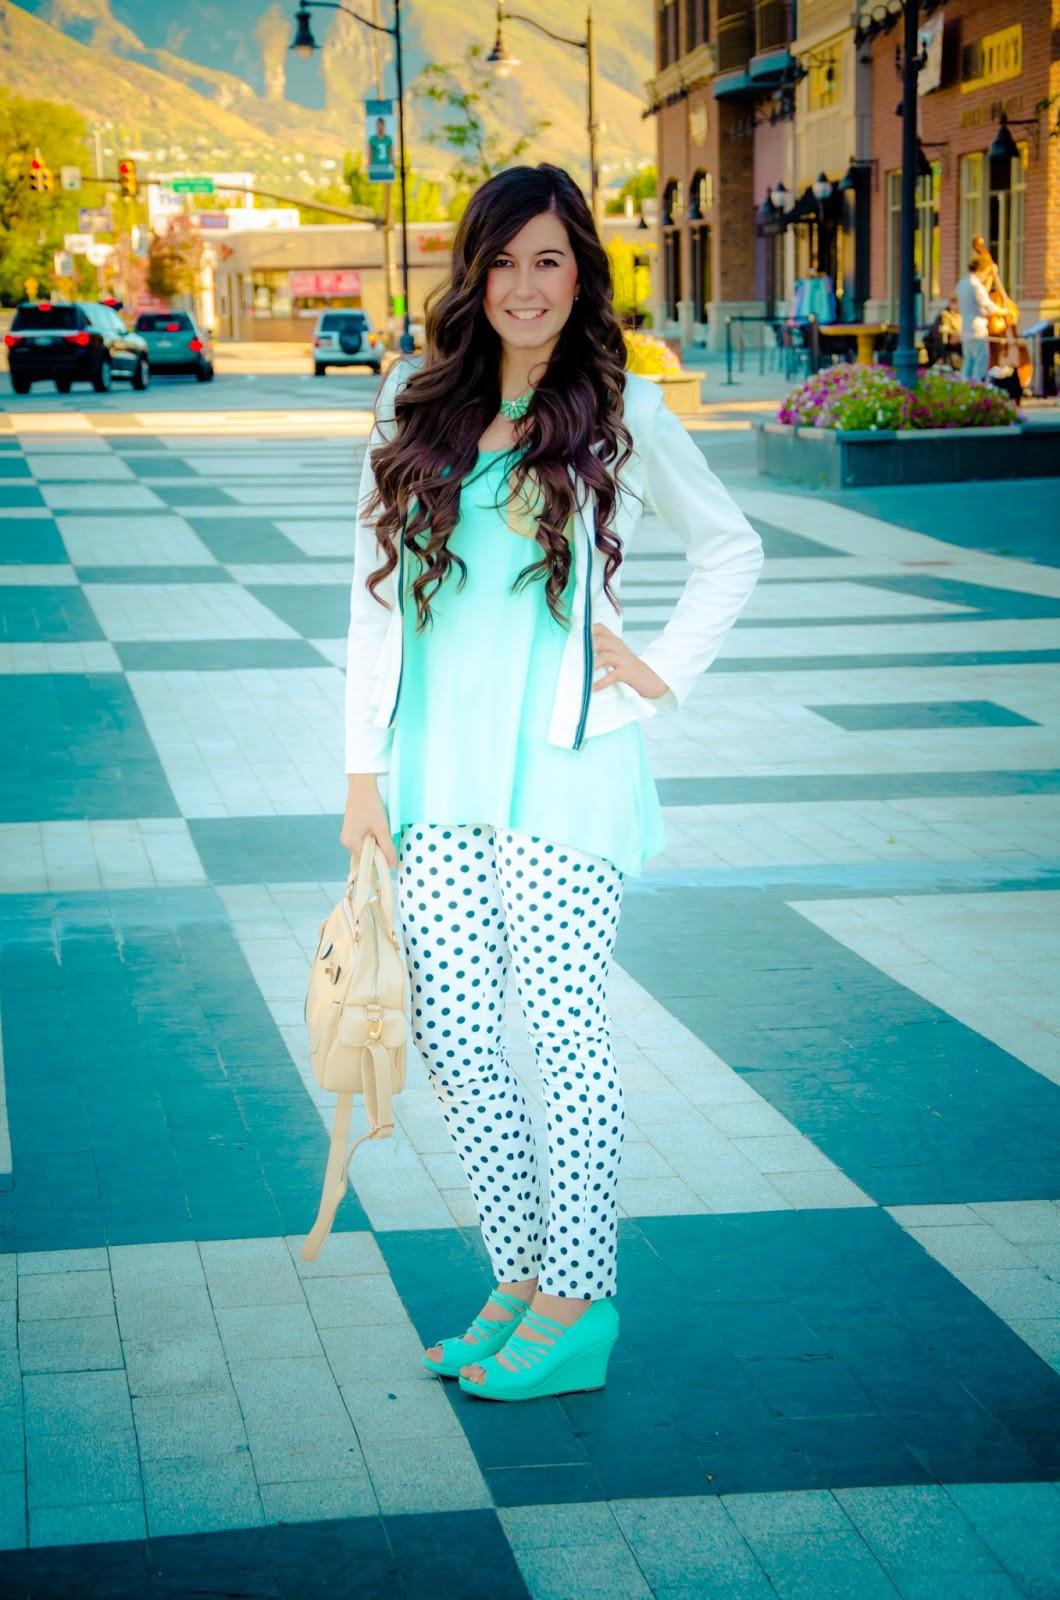 polka dot pants, peplum jacket, mint peplum top, mint flowy top, flowy attire, pink blush clothing, pinkblush, blackfive peplum jacket, pretty, cute, from day to night outfit, summer attire, fall outfit,